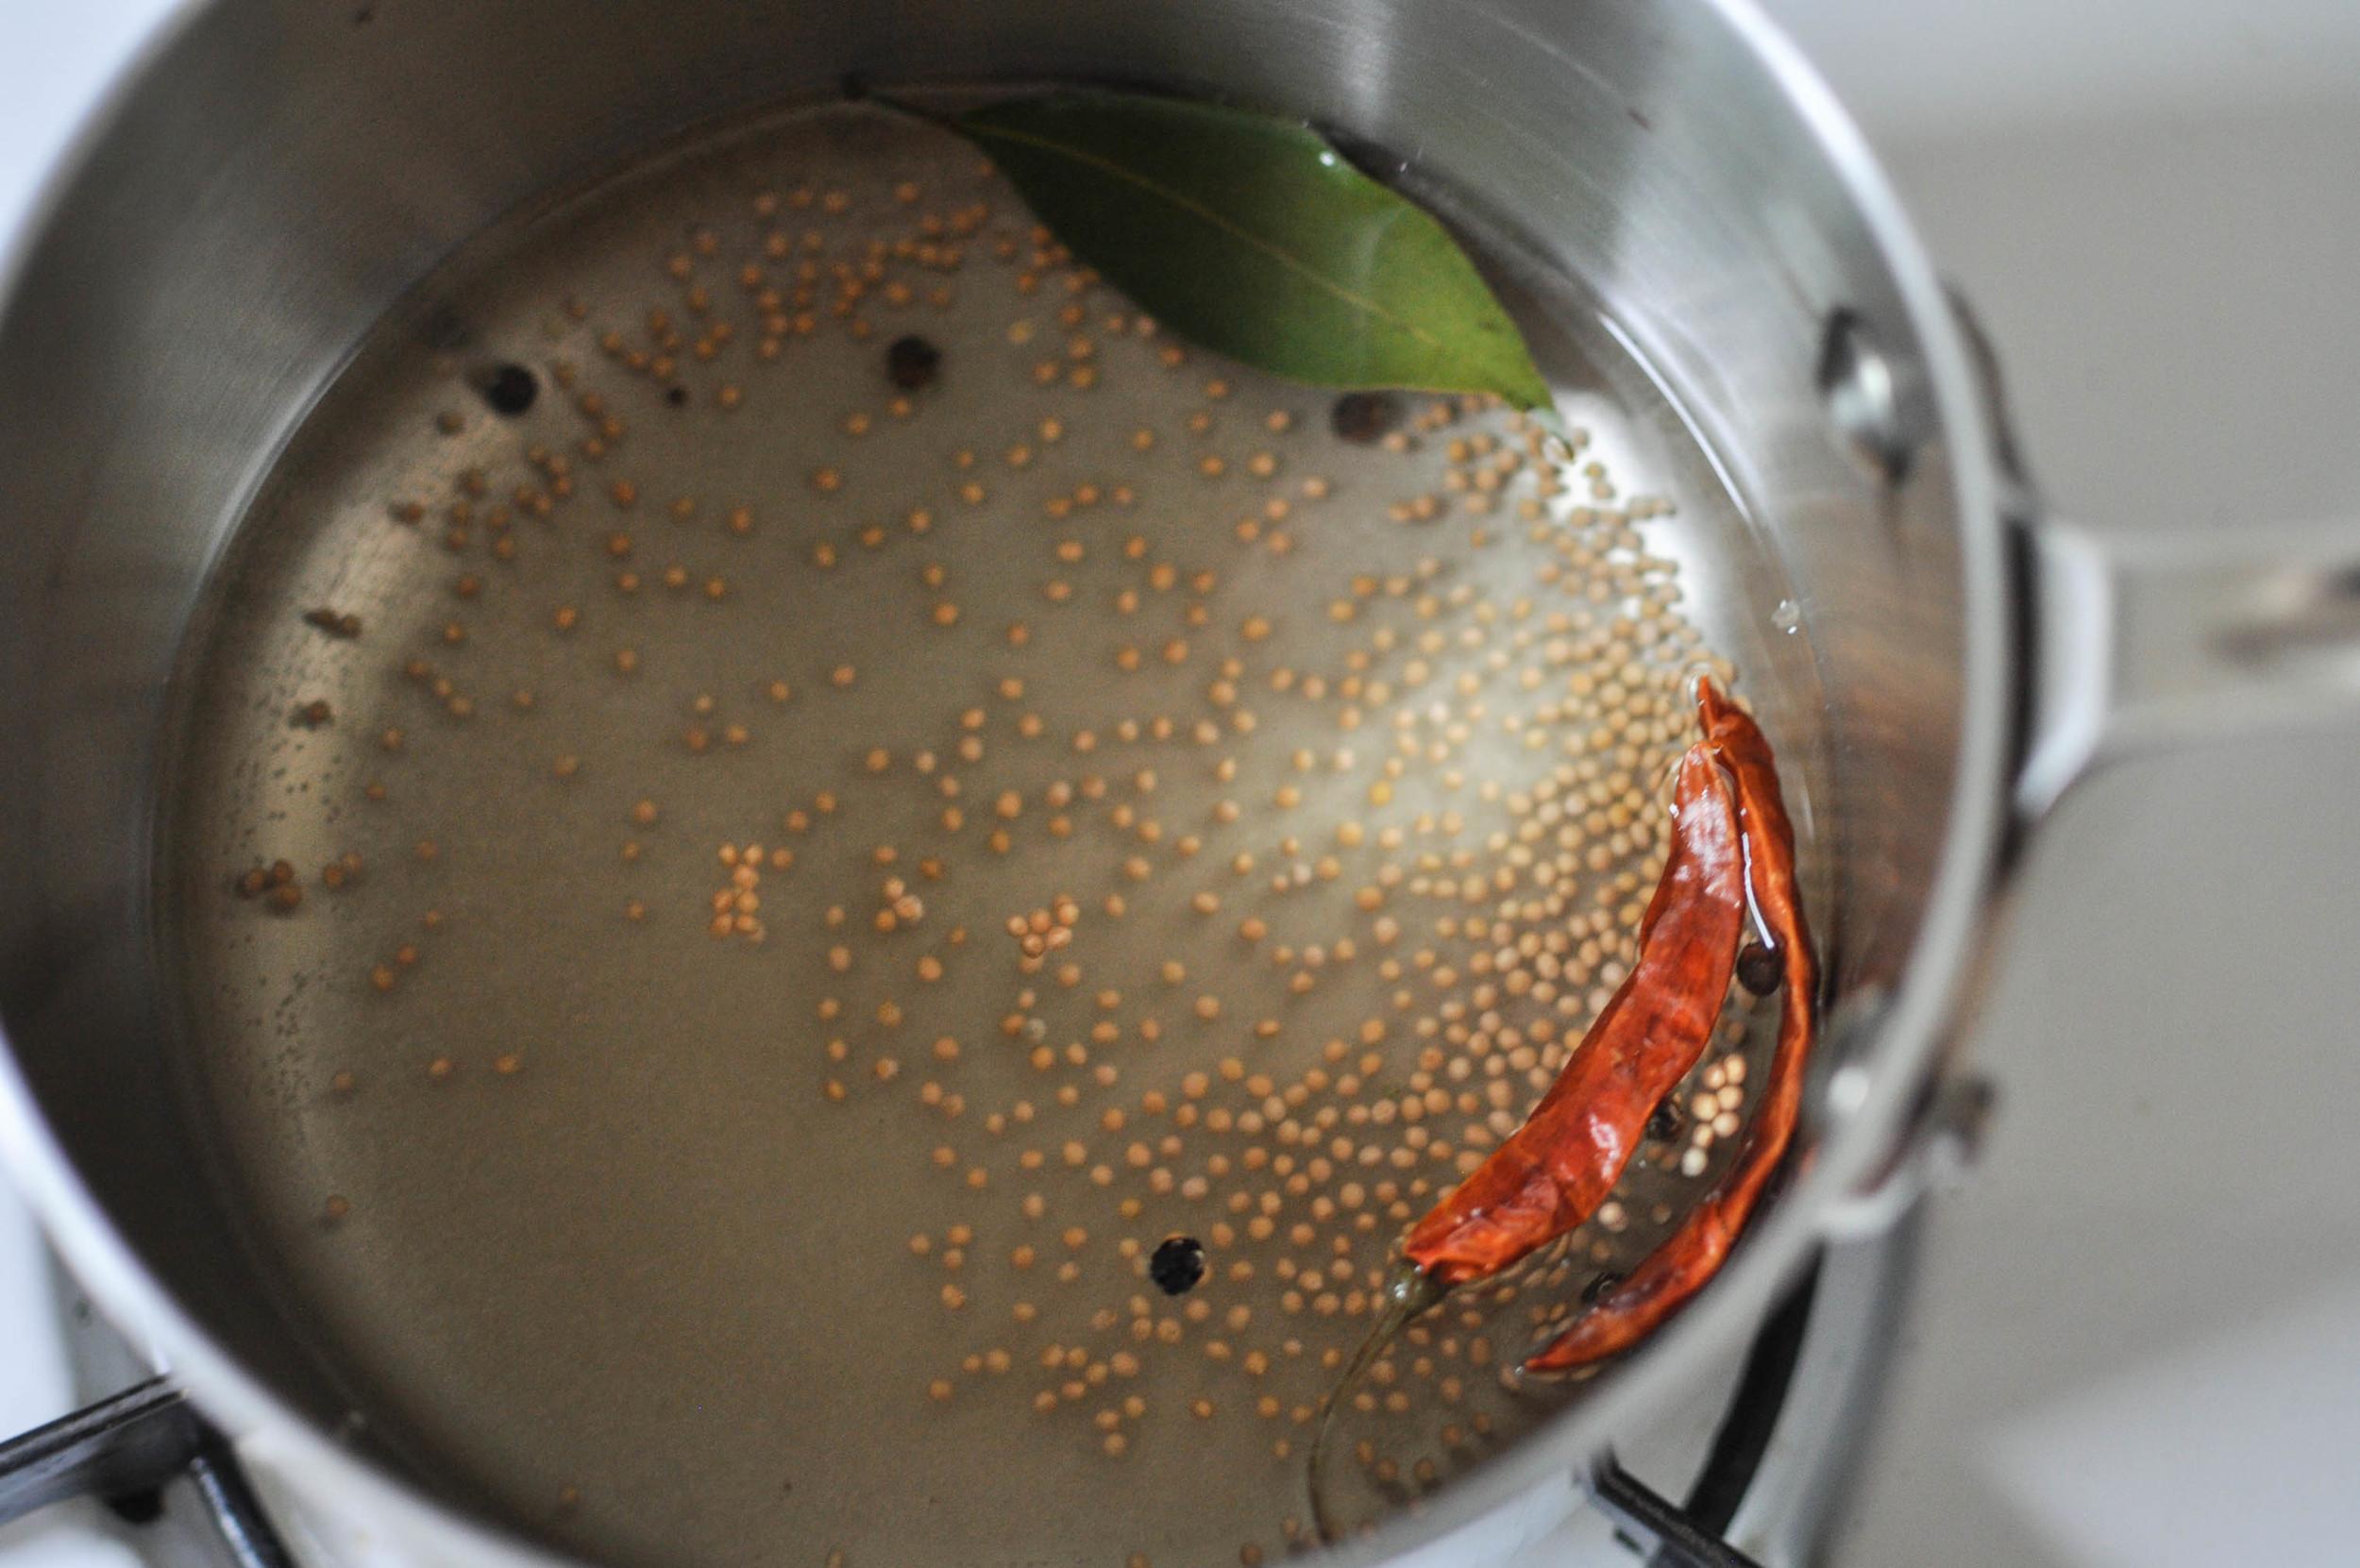 pickled_onions4.jpg